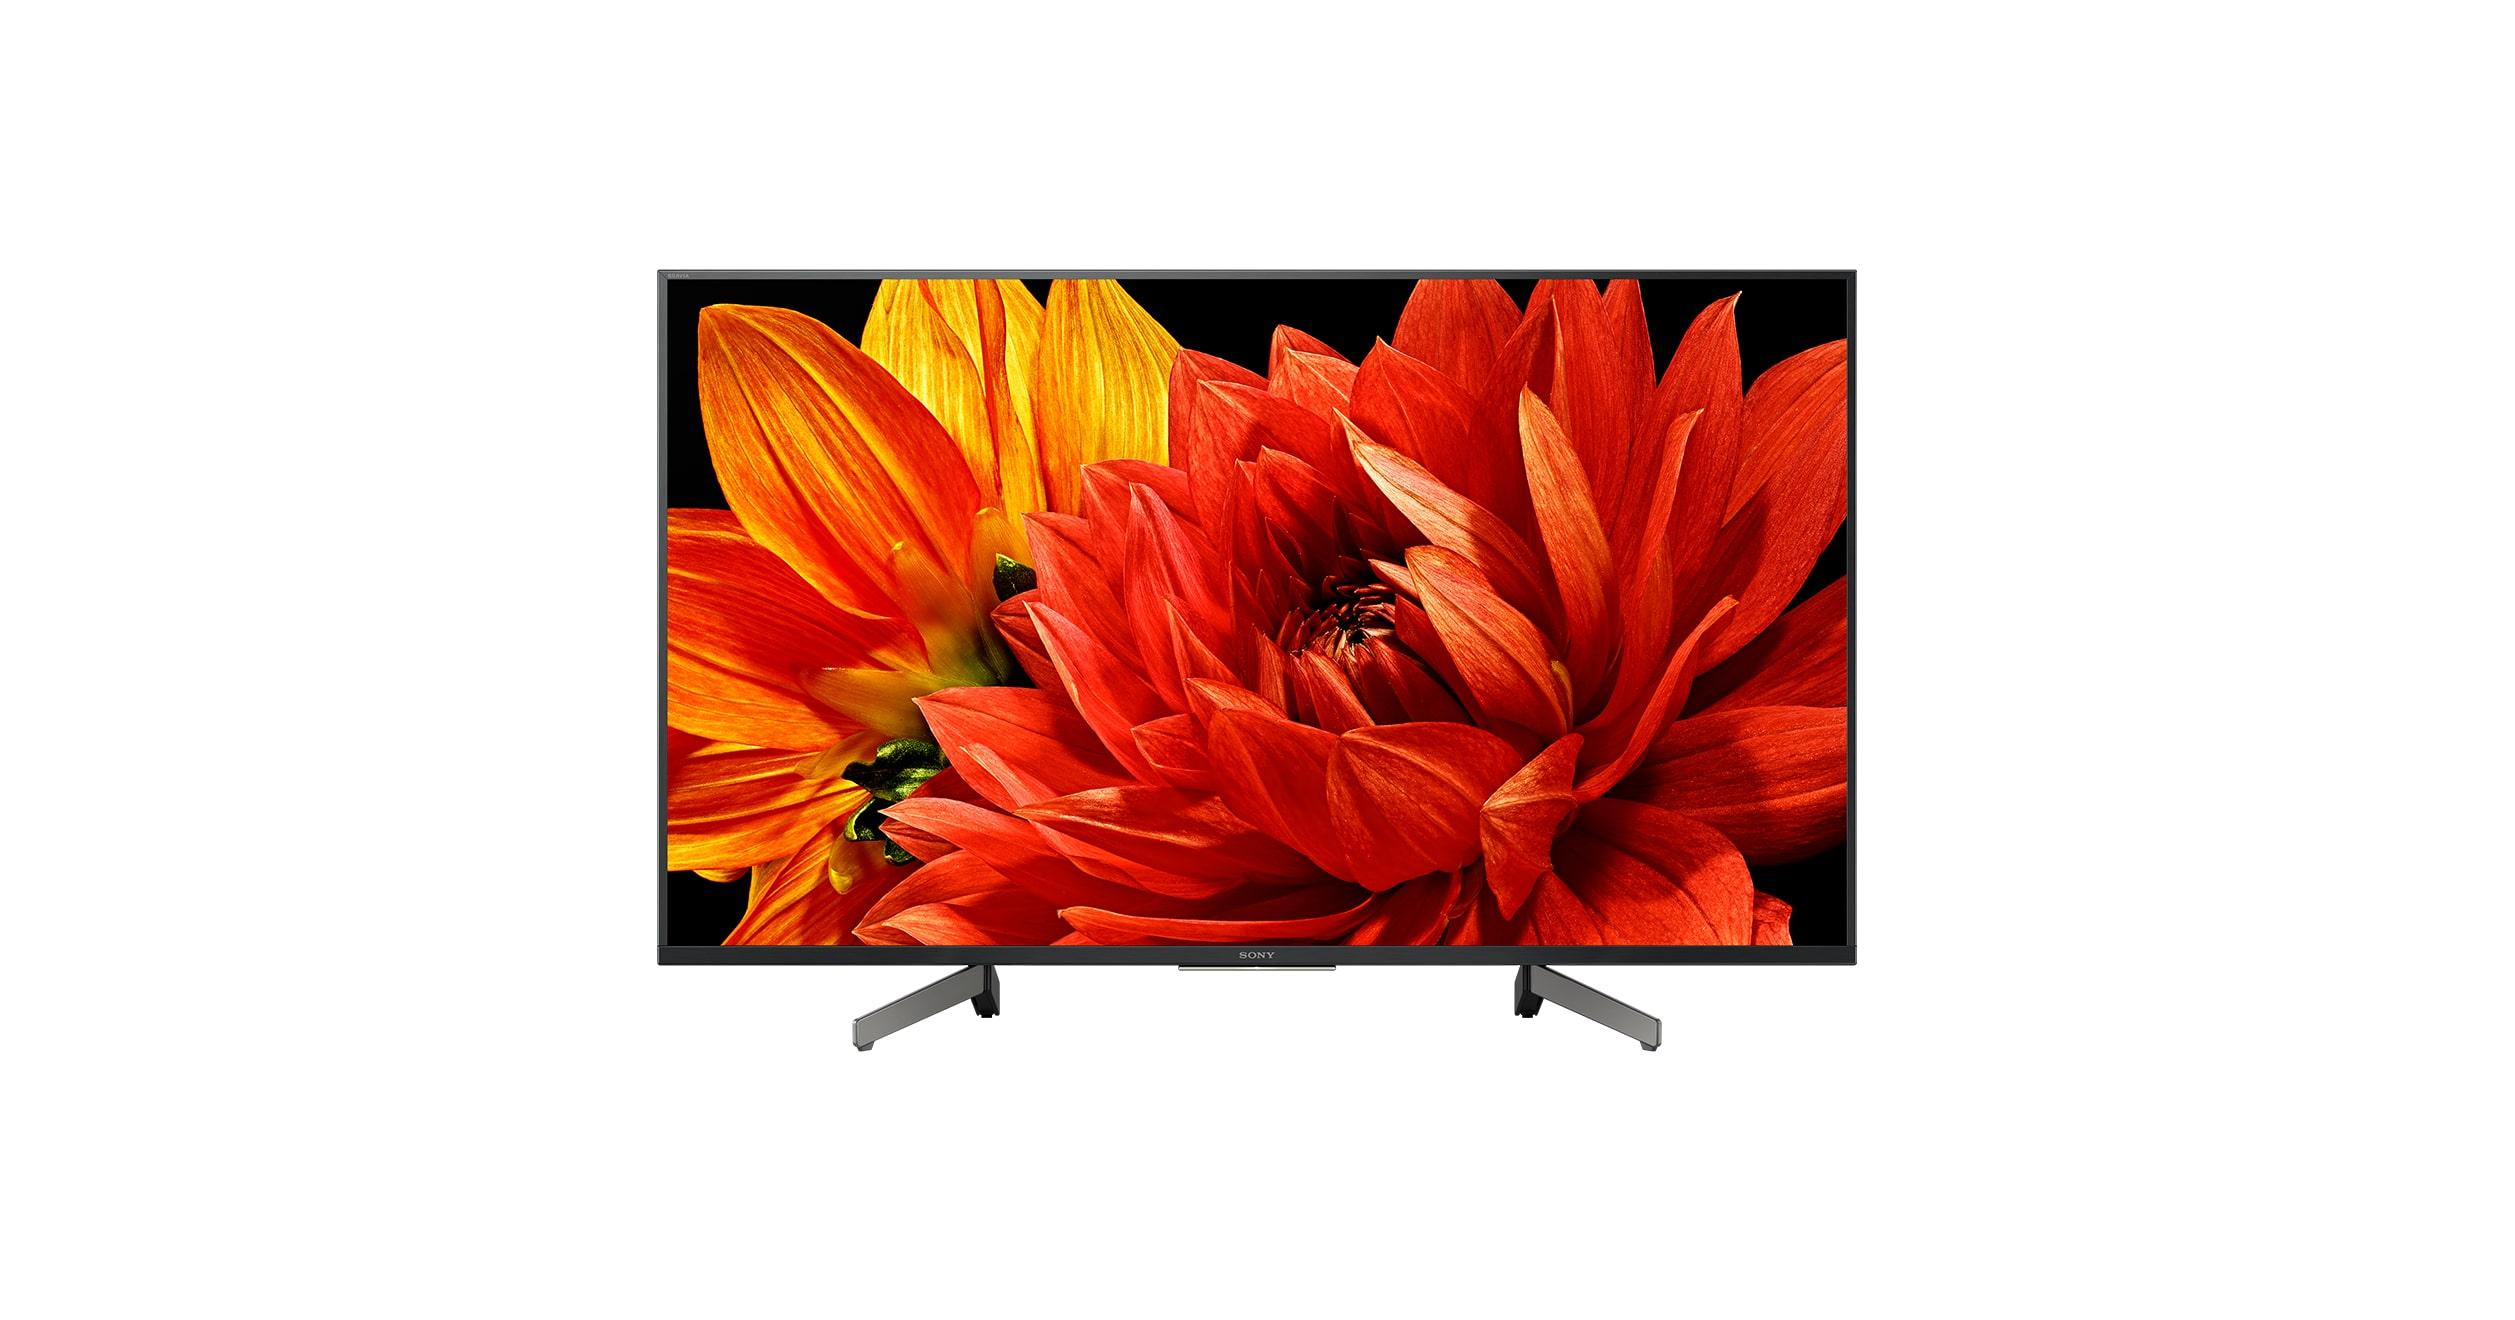 Sony XG83 | LED | 4K Ultra HD | High Dynamic Range (HDR) | Smart TV